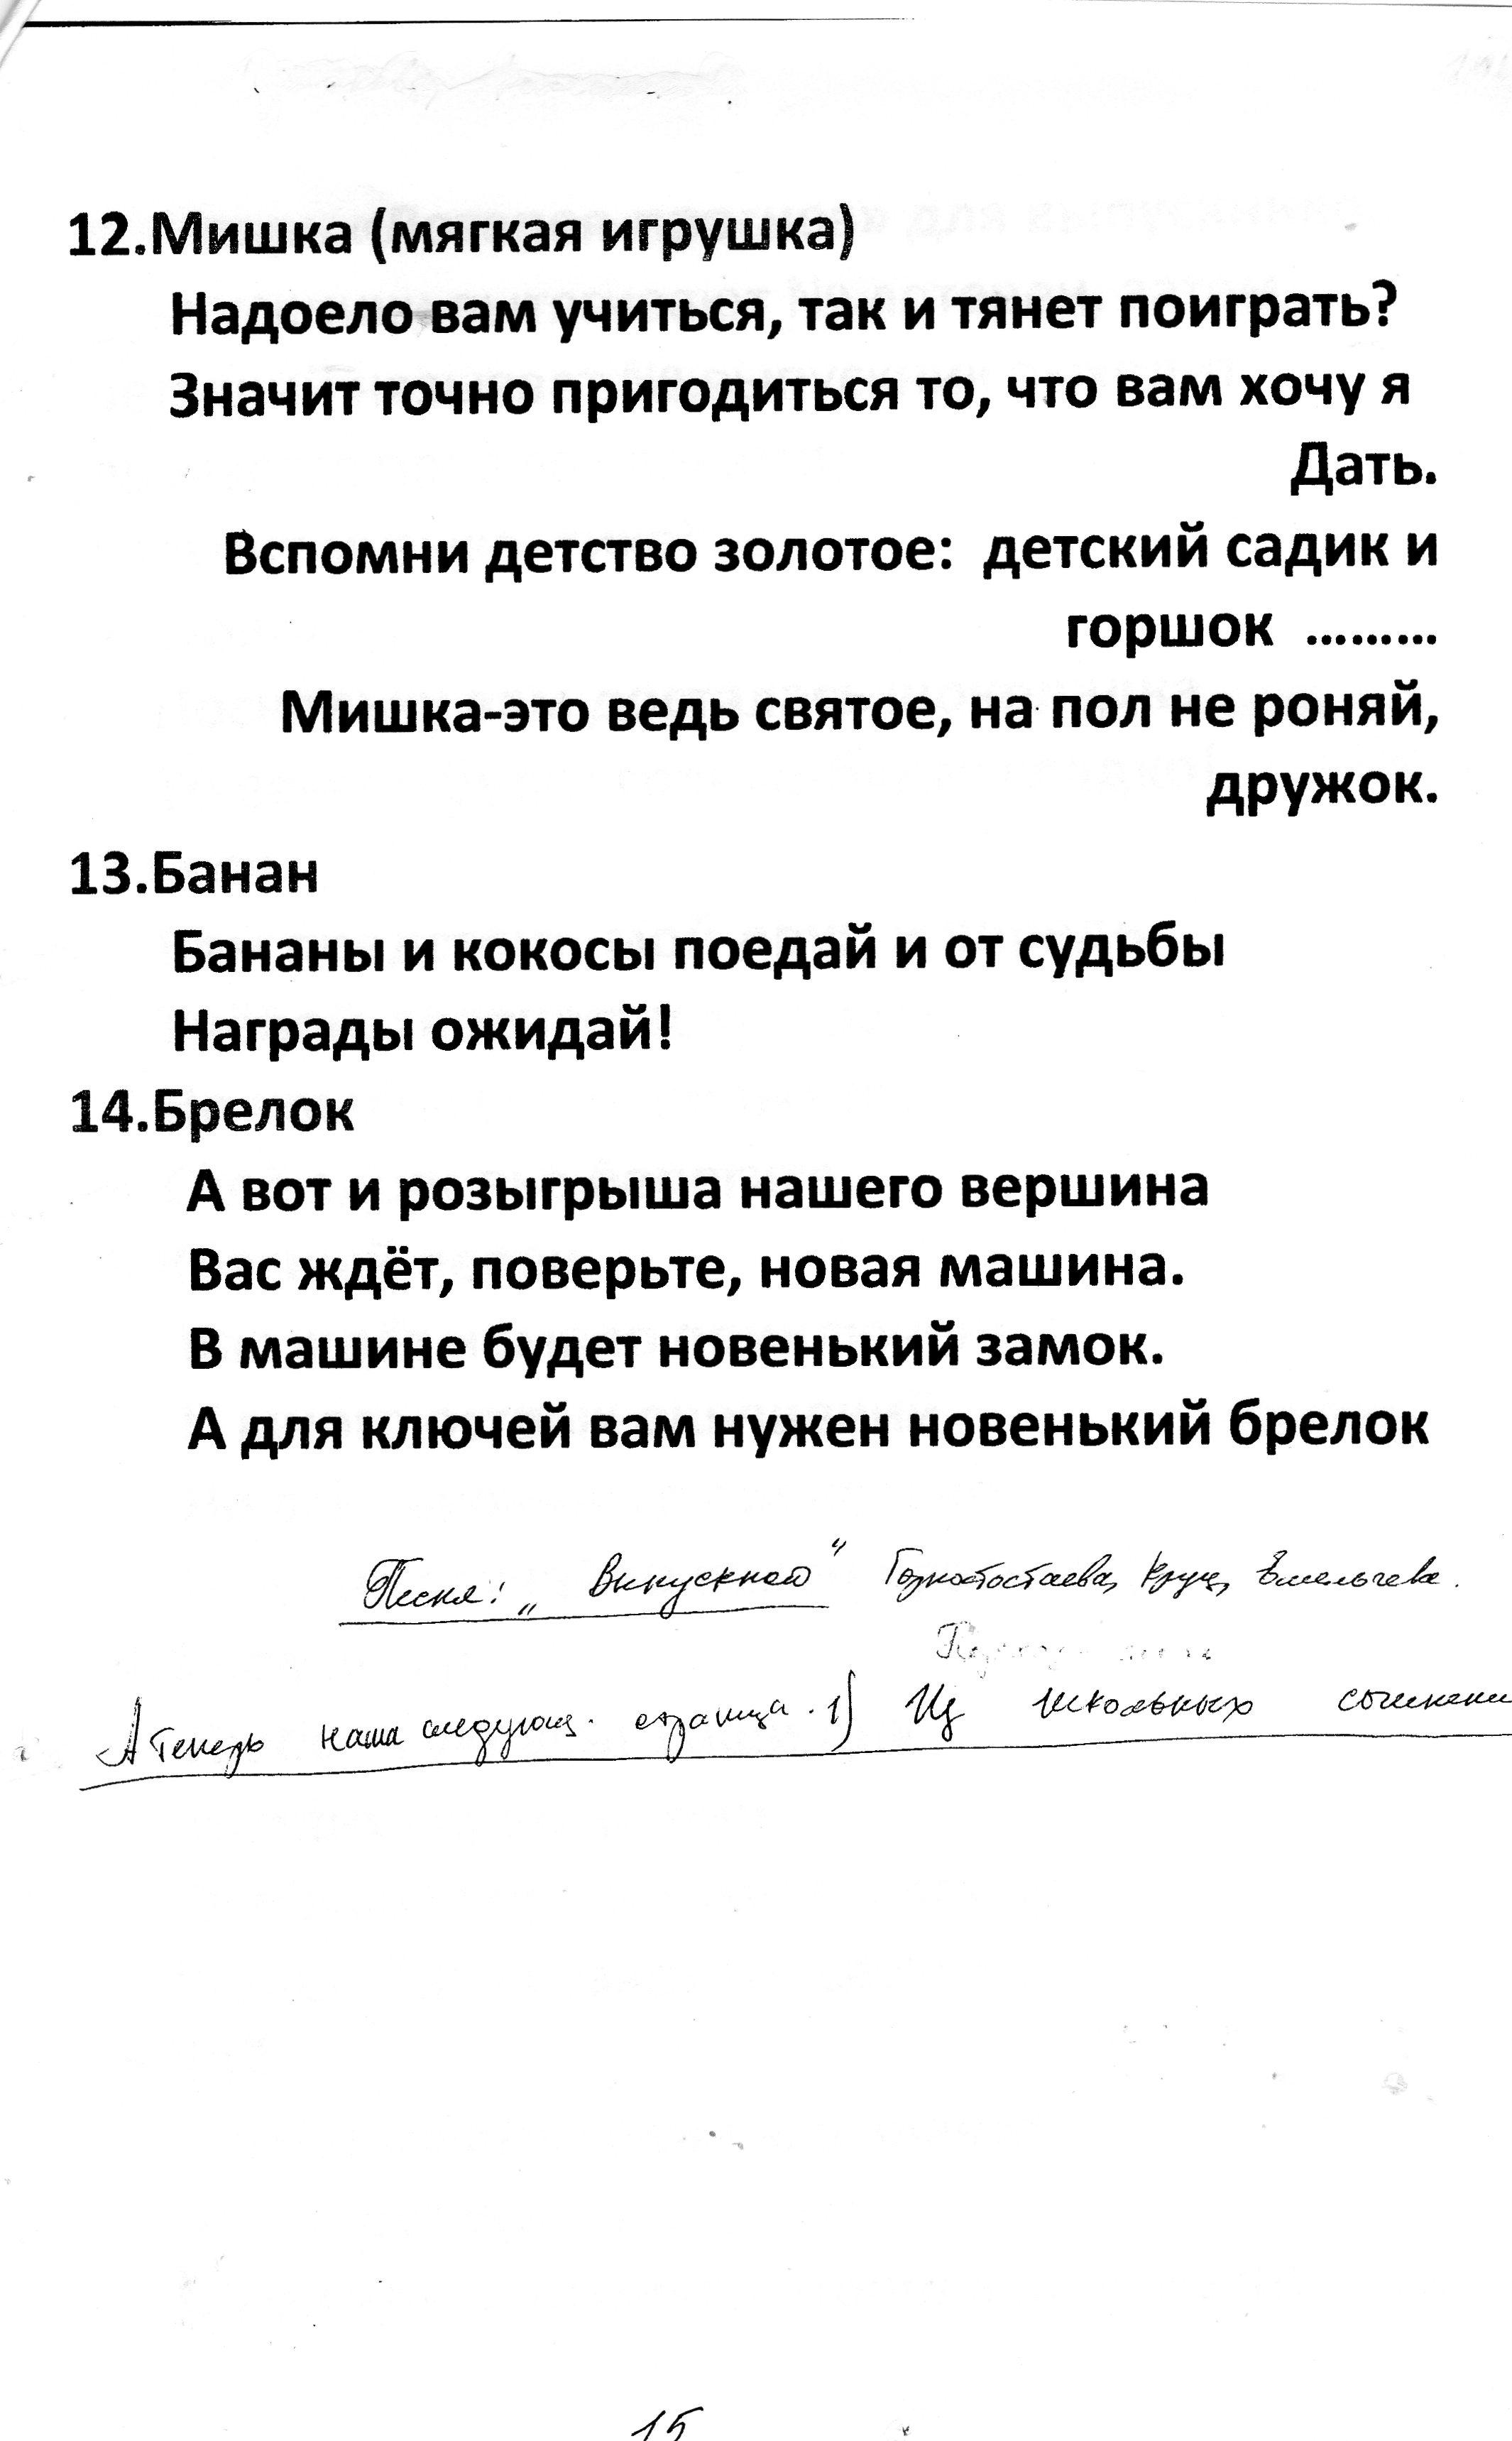 C:\Documents and Settings\ADMIN\Мои документы\9 кл выпускной\img021.jpg